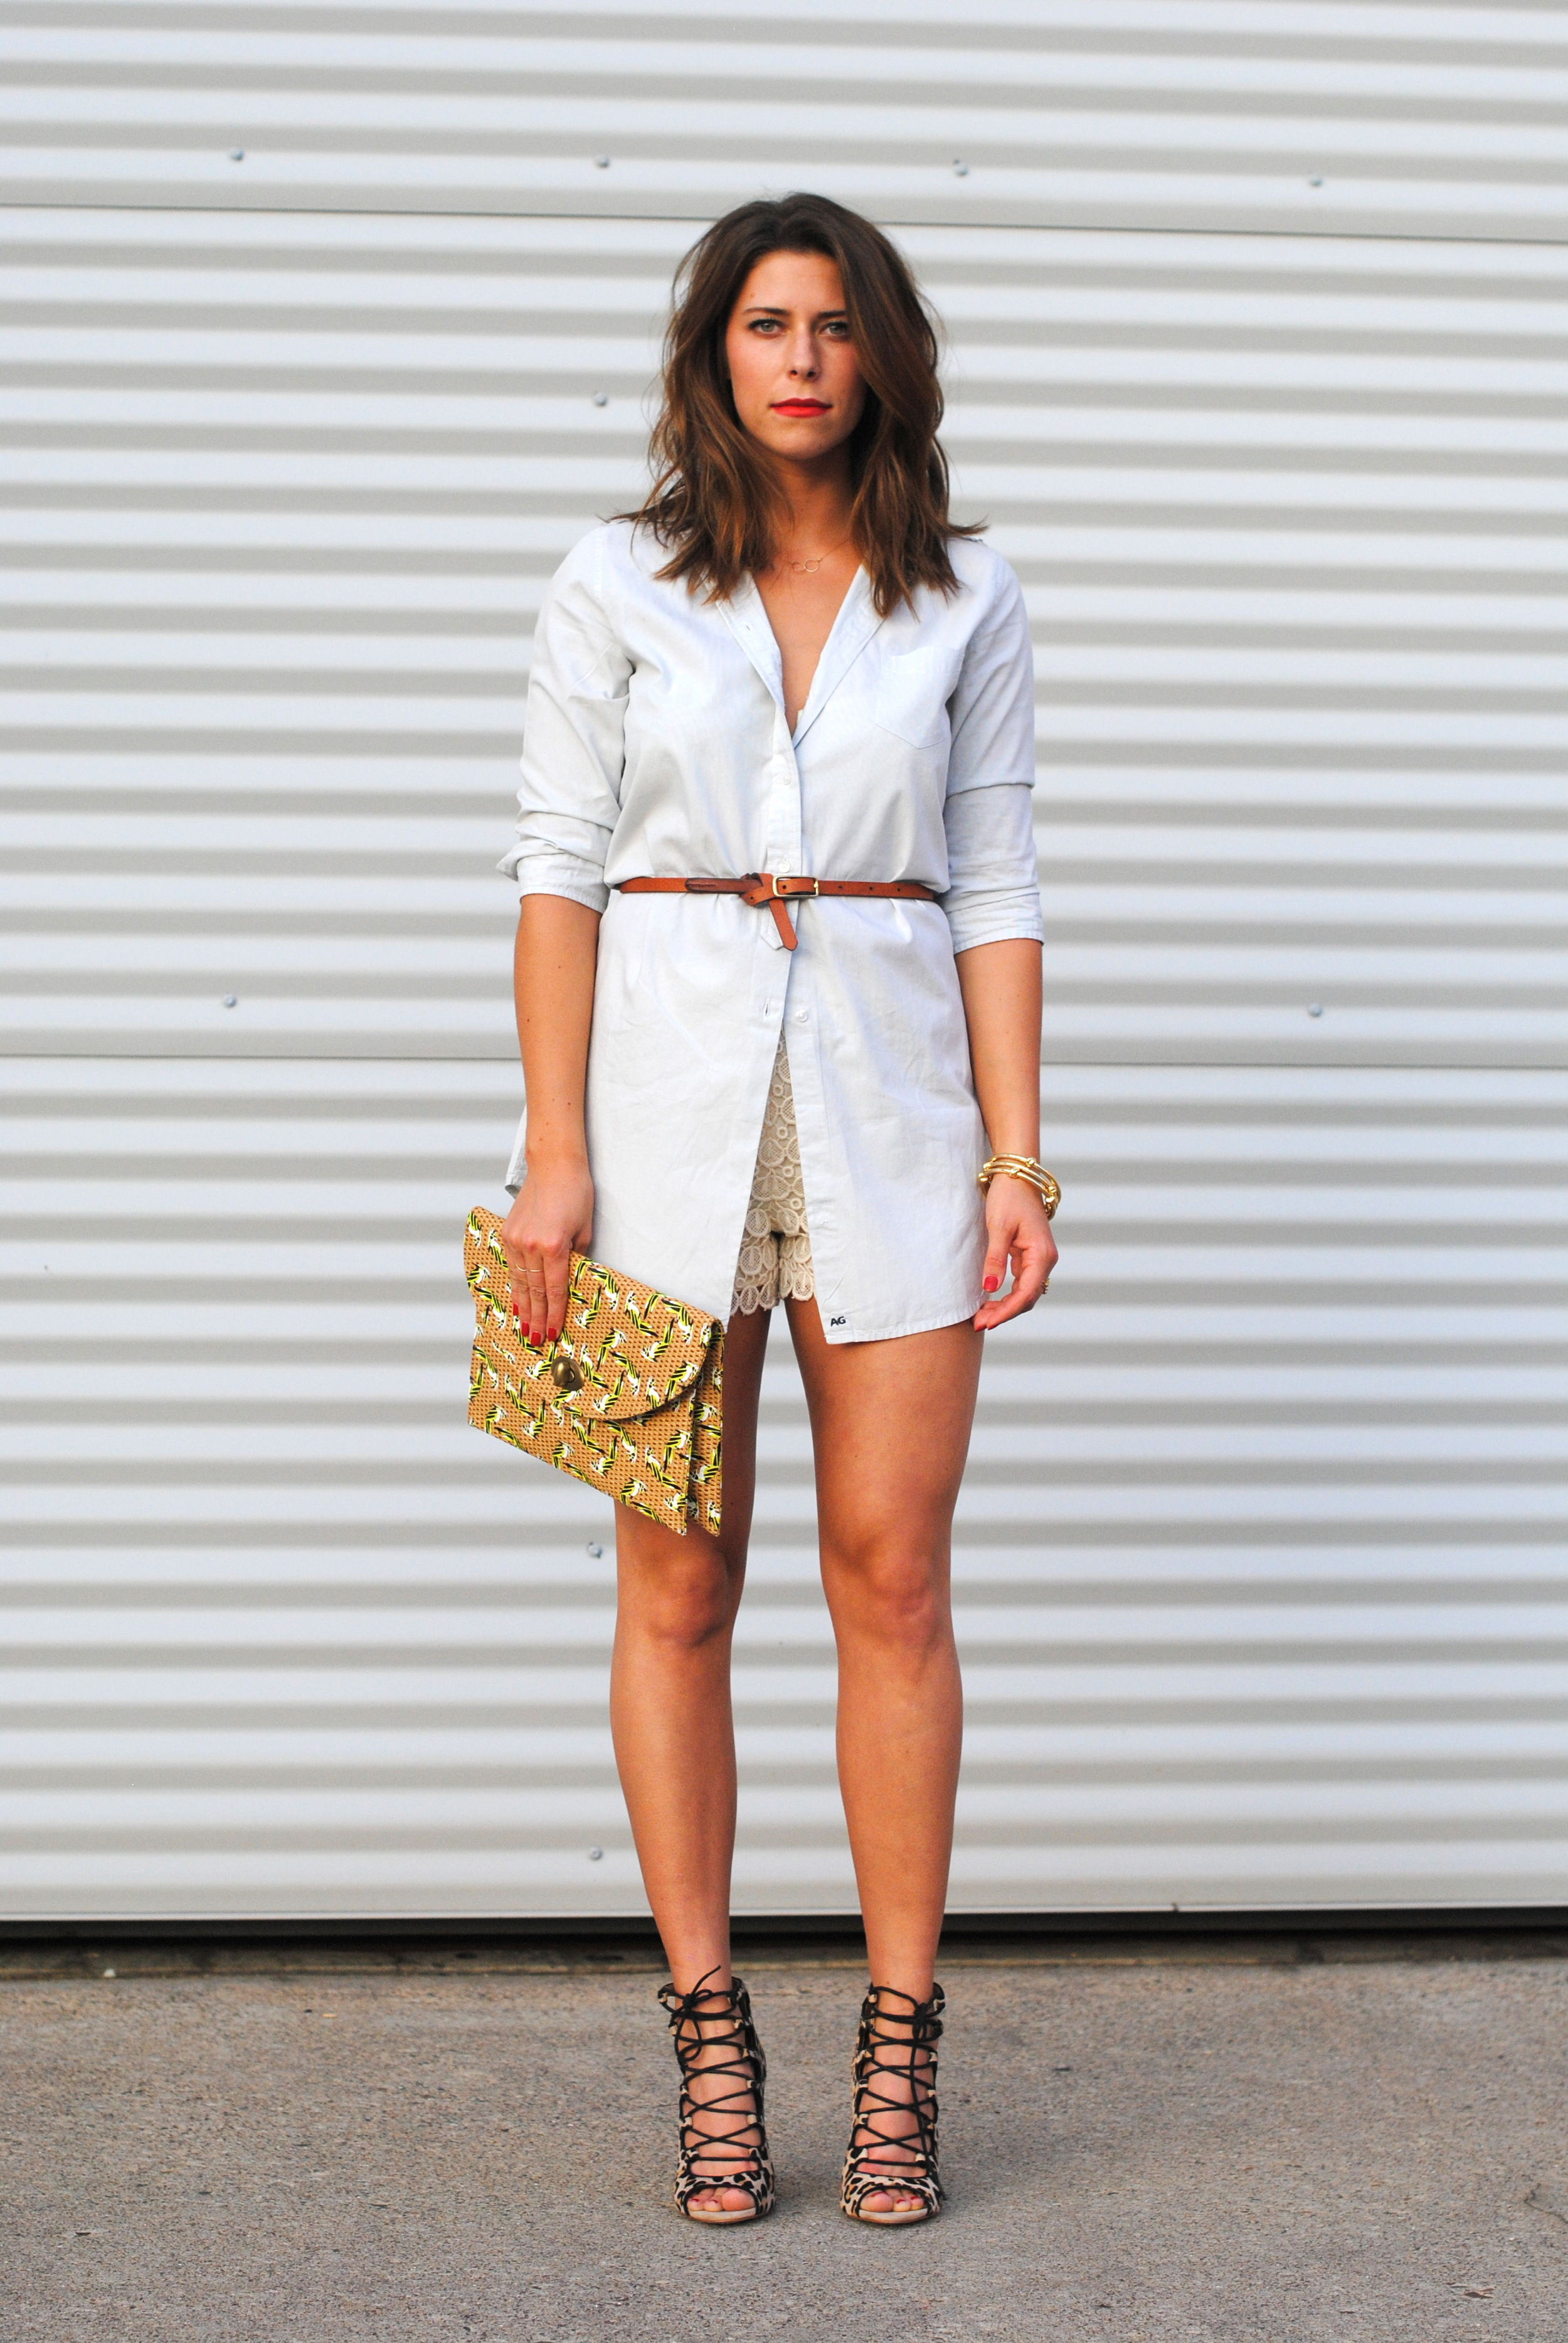 AG shirtdress, alternative  here    Club Monaco lace shorts   Zara lace up heels, alternative  here  (love these!)  Anthropologie clutch, alternative  here    Madewell belt    Knot bangles